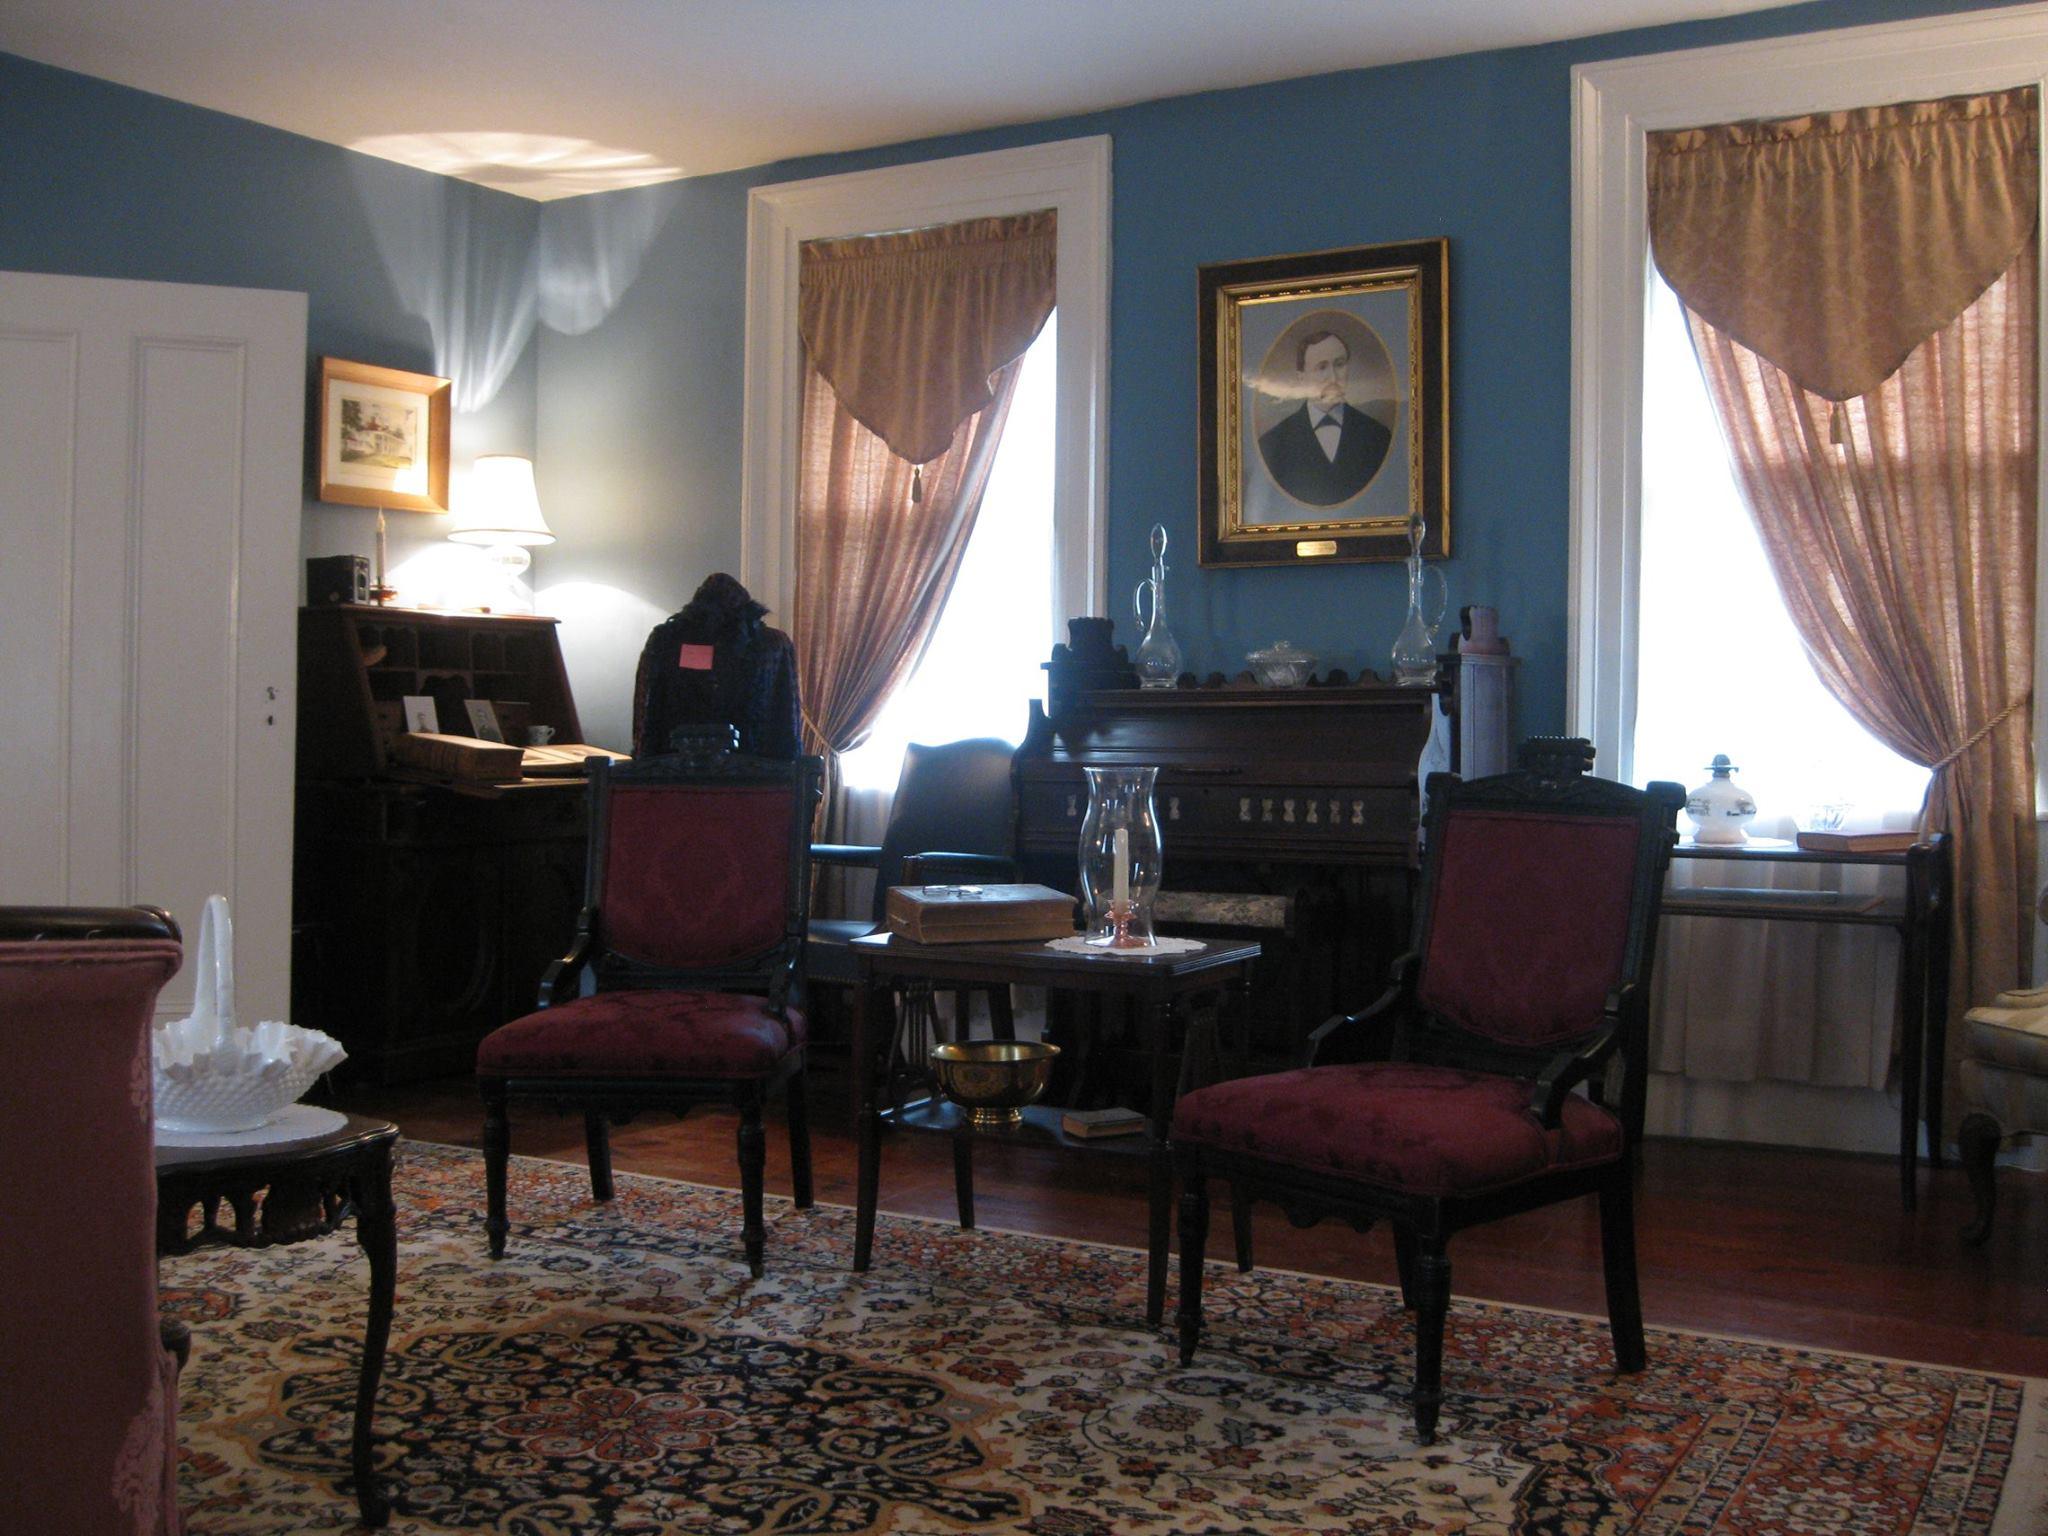 Carhart Room